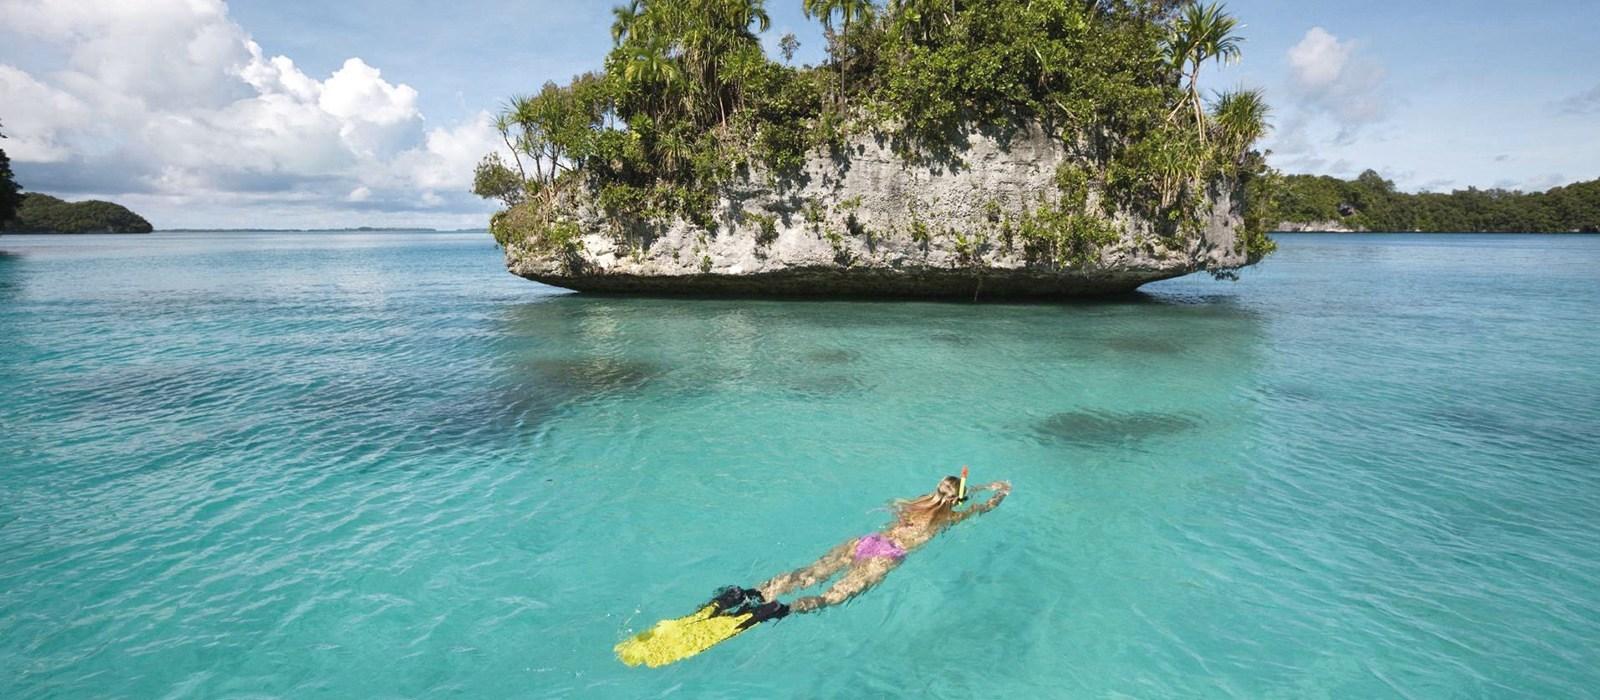 Best Island To Hike